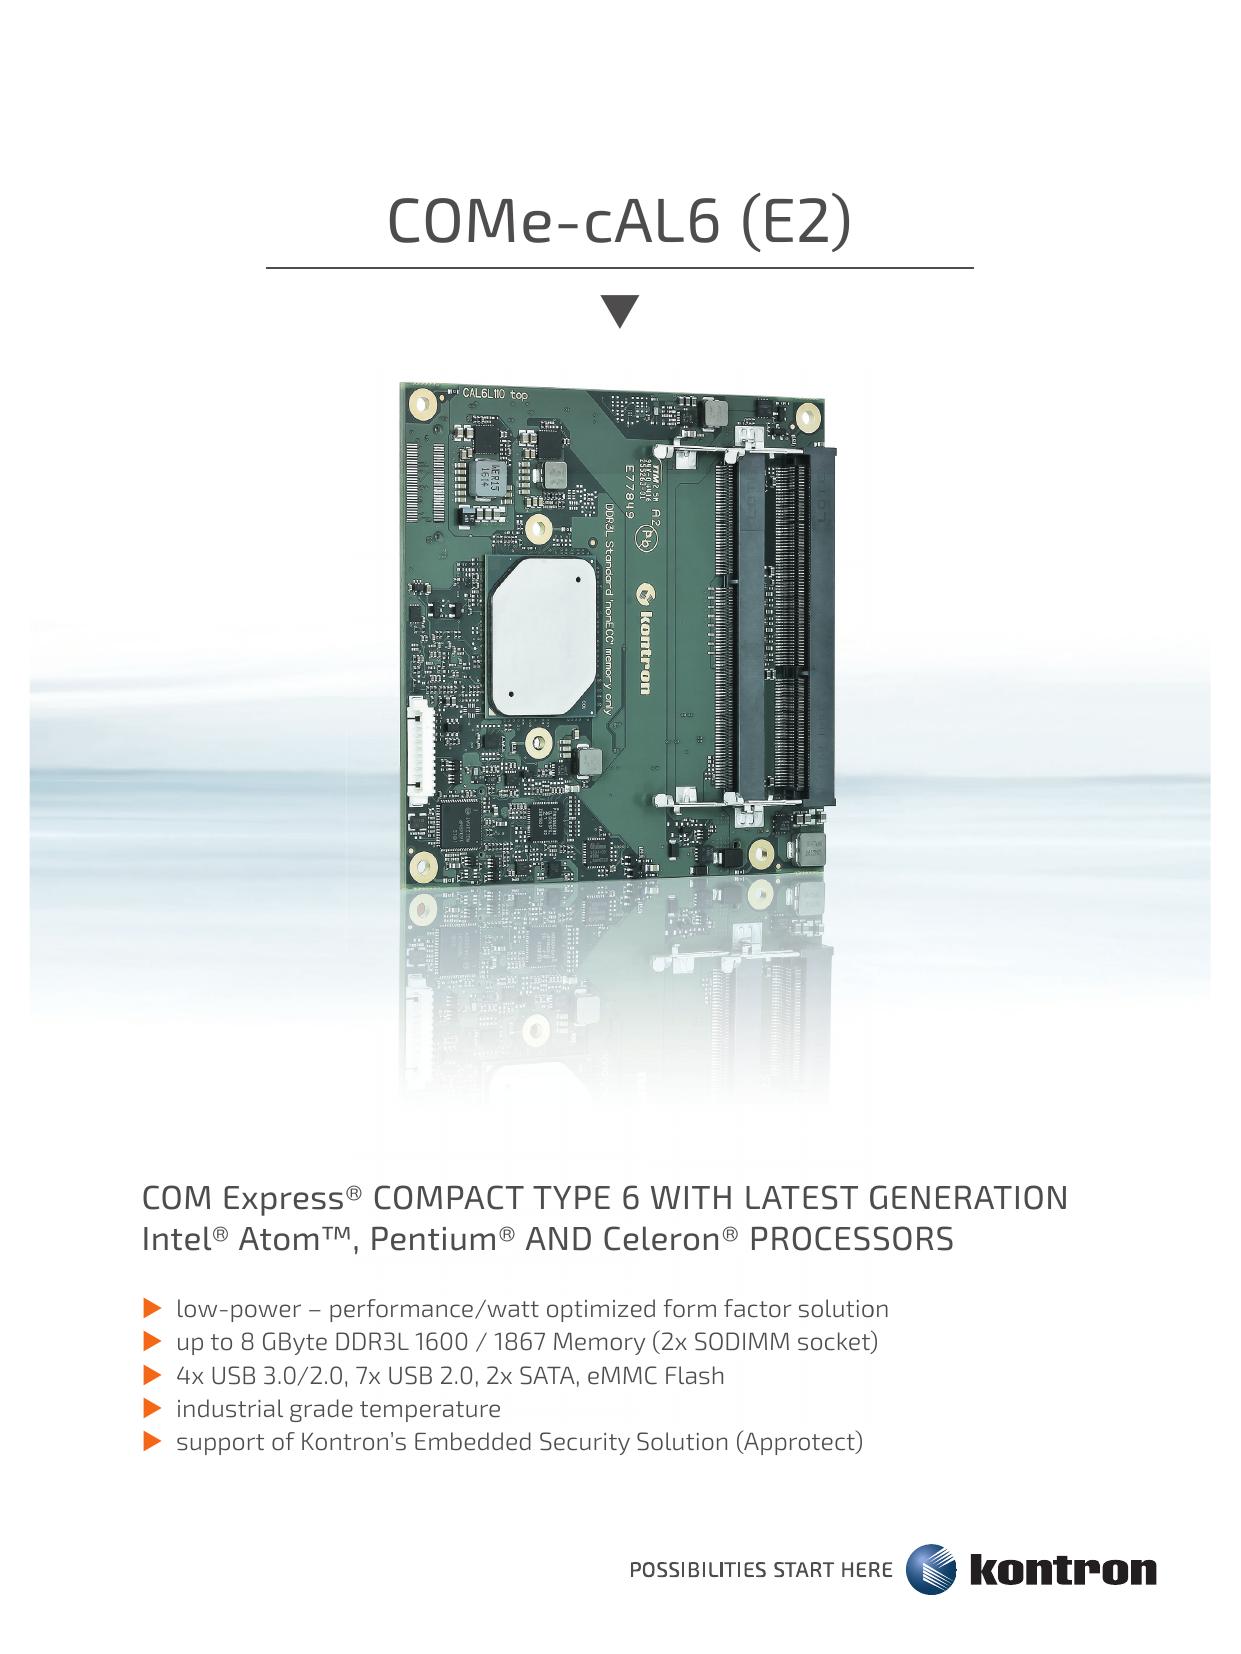 COM Express compact モジュール COMe-cAL6